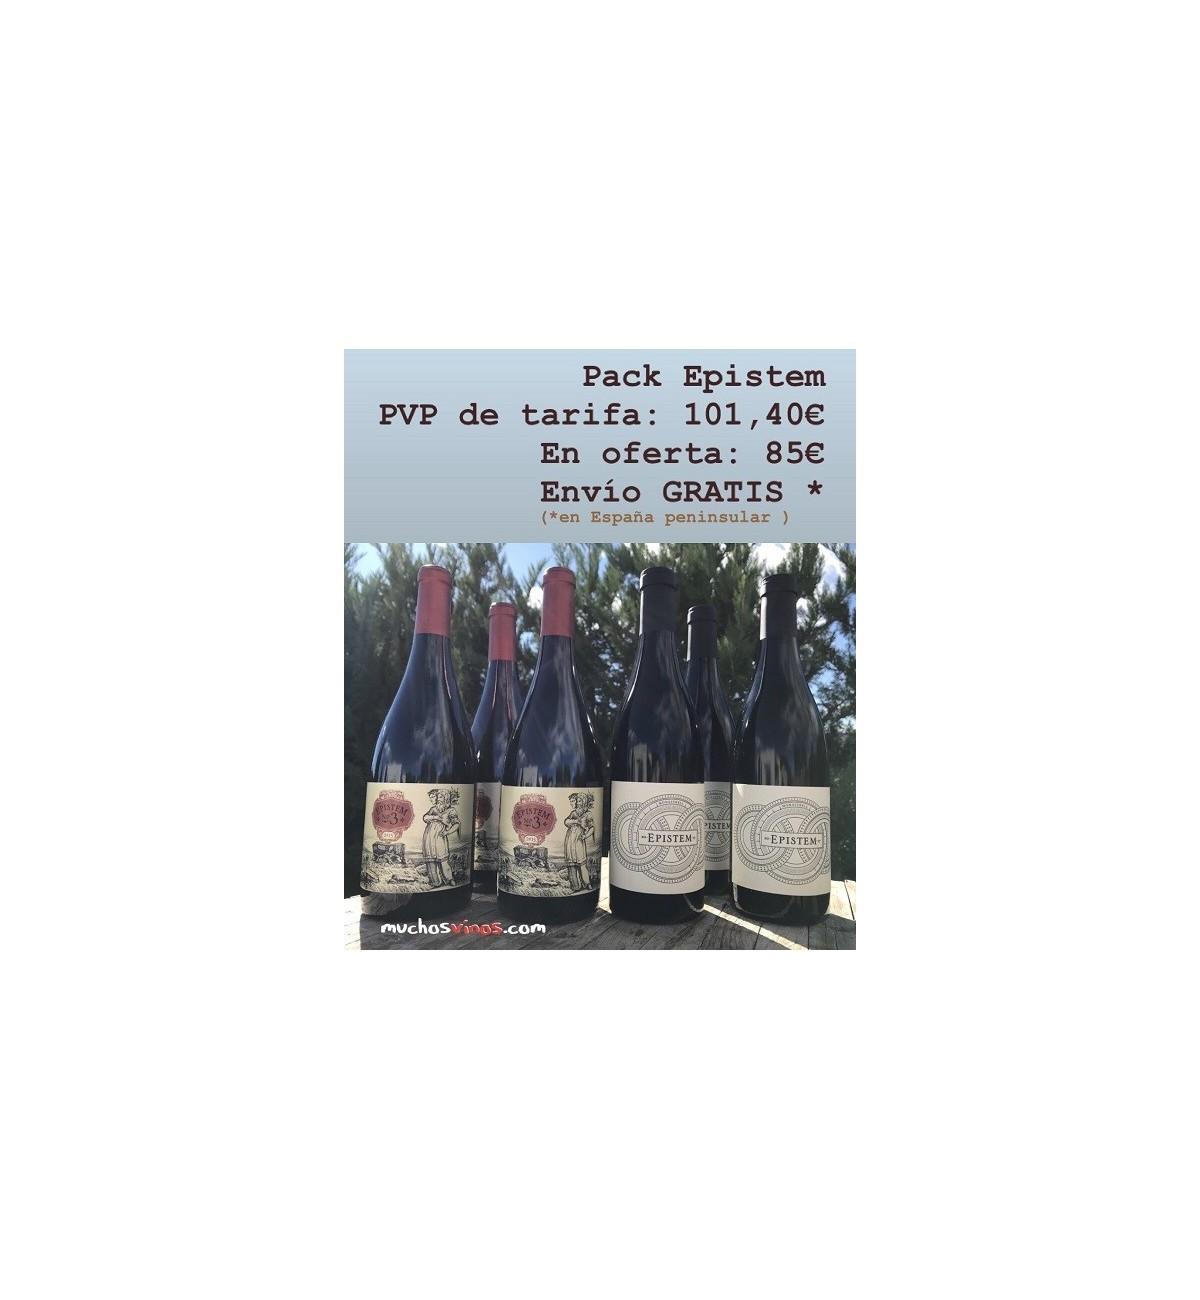 Pack EPISTEM de Atlan & Artisan, gastos de ENVÍO GRATIS, vino tinto, Monastrell, viñas viejasalle, Pío del Ramo